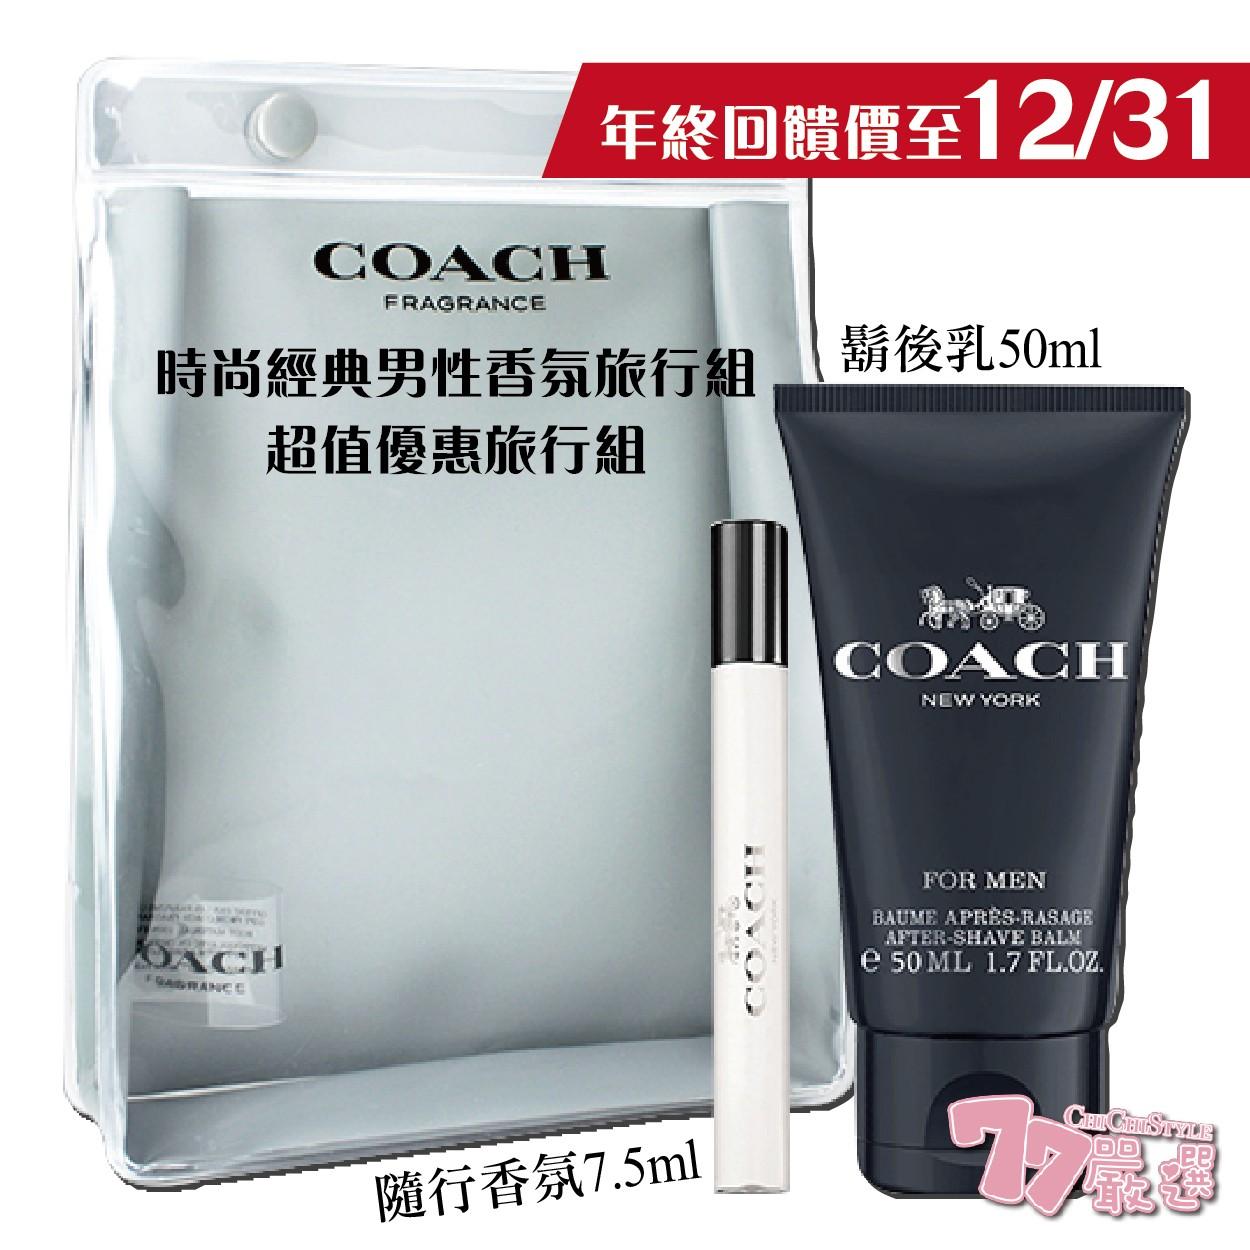 COACH 寇馳 時尚經典男性香氛旅行組 淡香水7.5ML+鬍後乳50ML